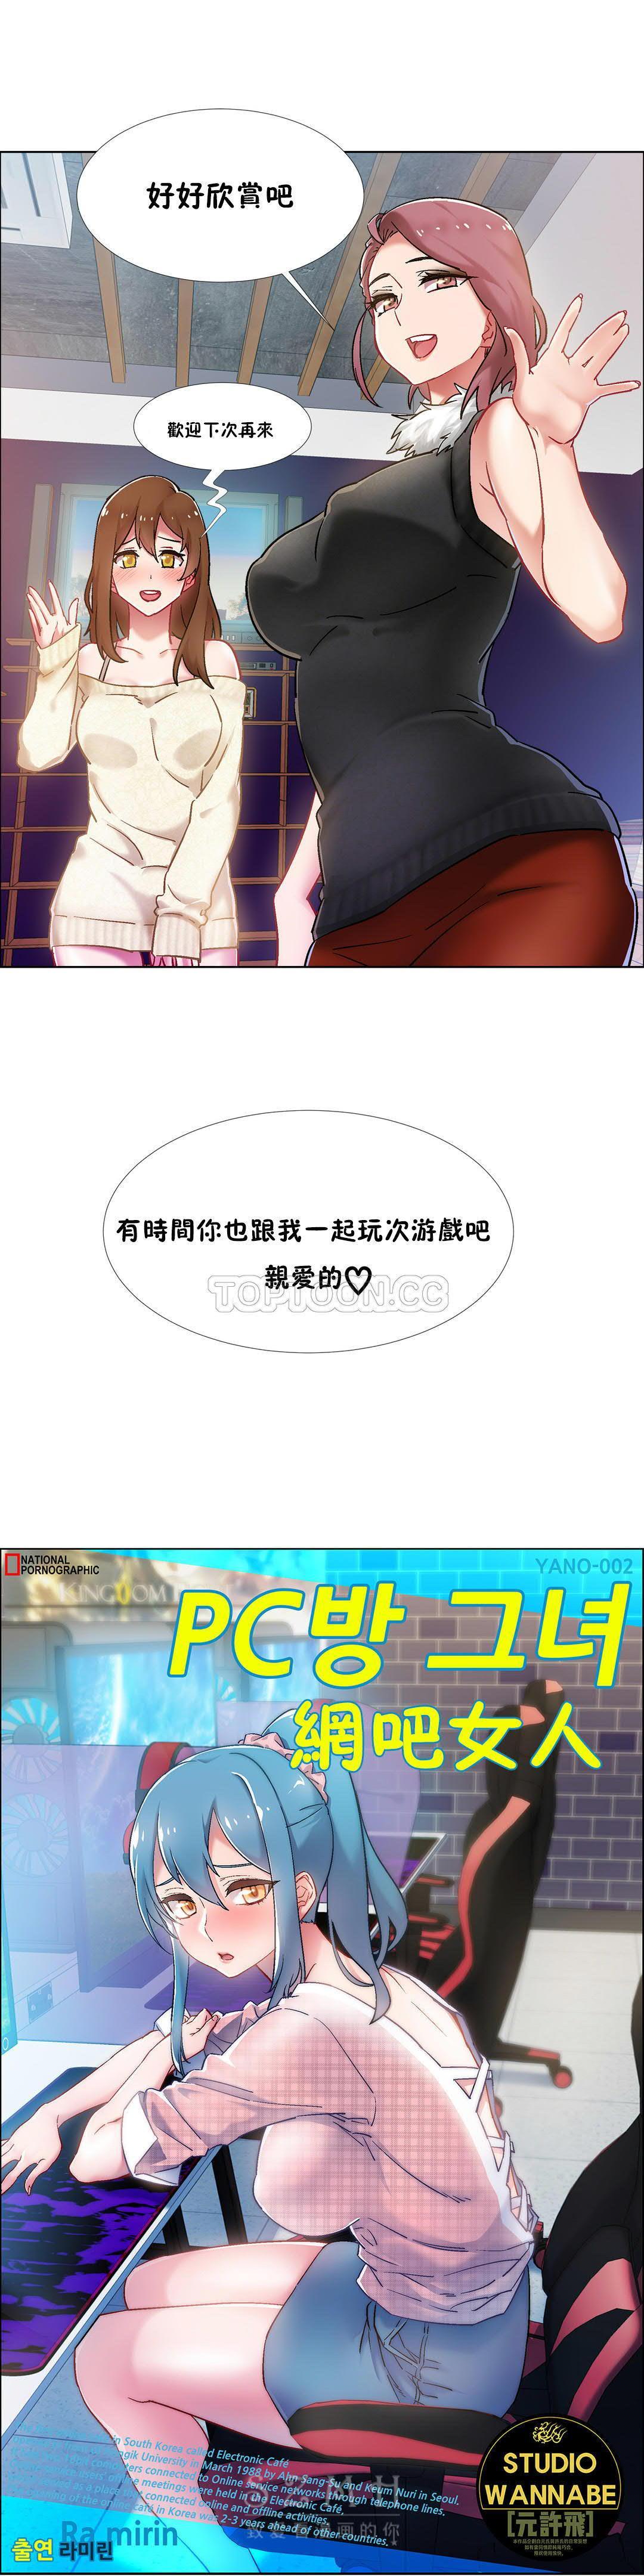 [Studio Wannabe] Rental Girls | 出租女郎 Ch. 33-58 [Chinese]  第二季 完结 8